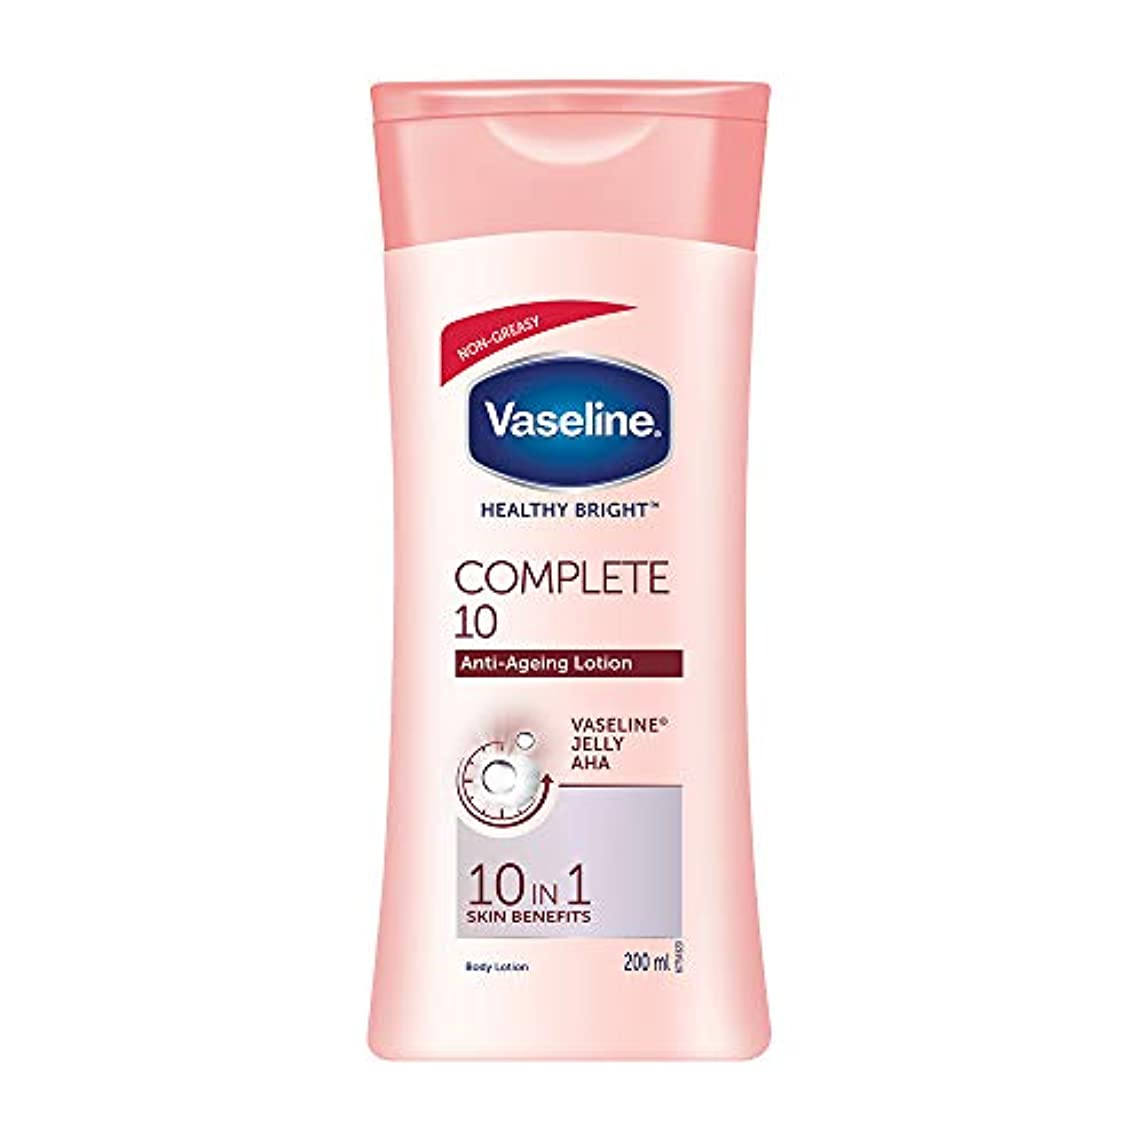 Vaseline Healthy White Complete 10 AHA and Pro Retinol, 200ml